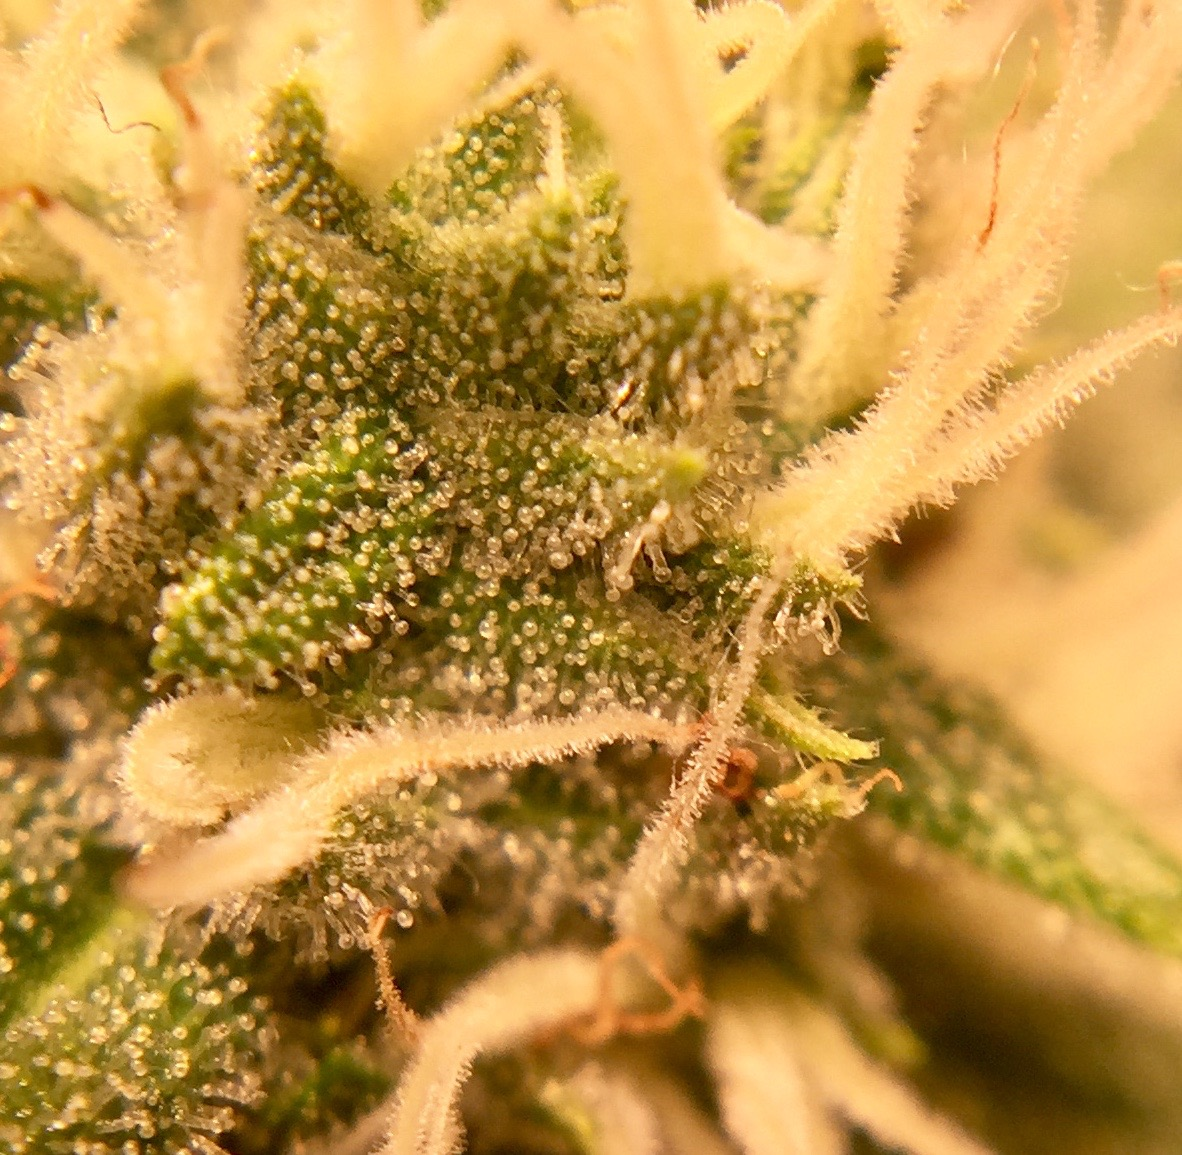 Emerald Zoo Den: Cannabis Sugary Flower